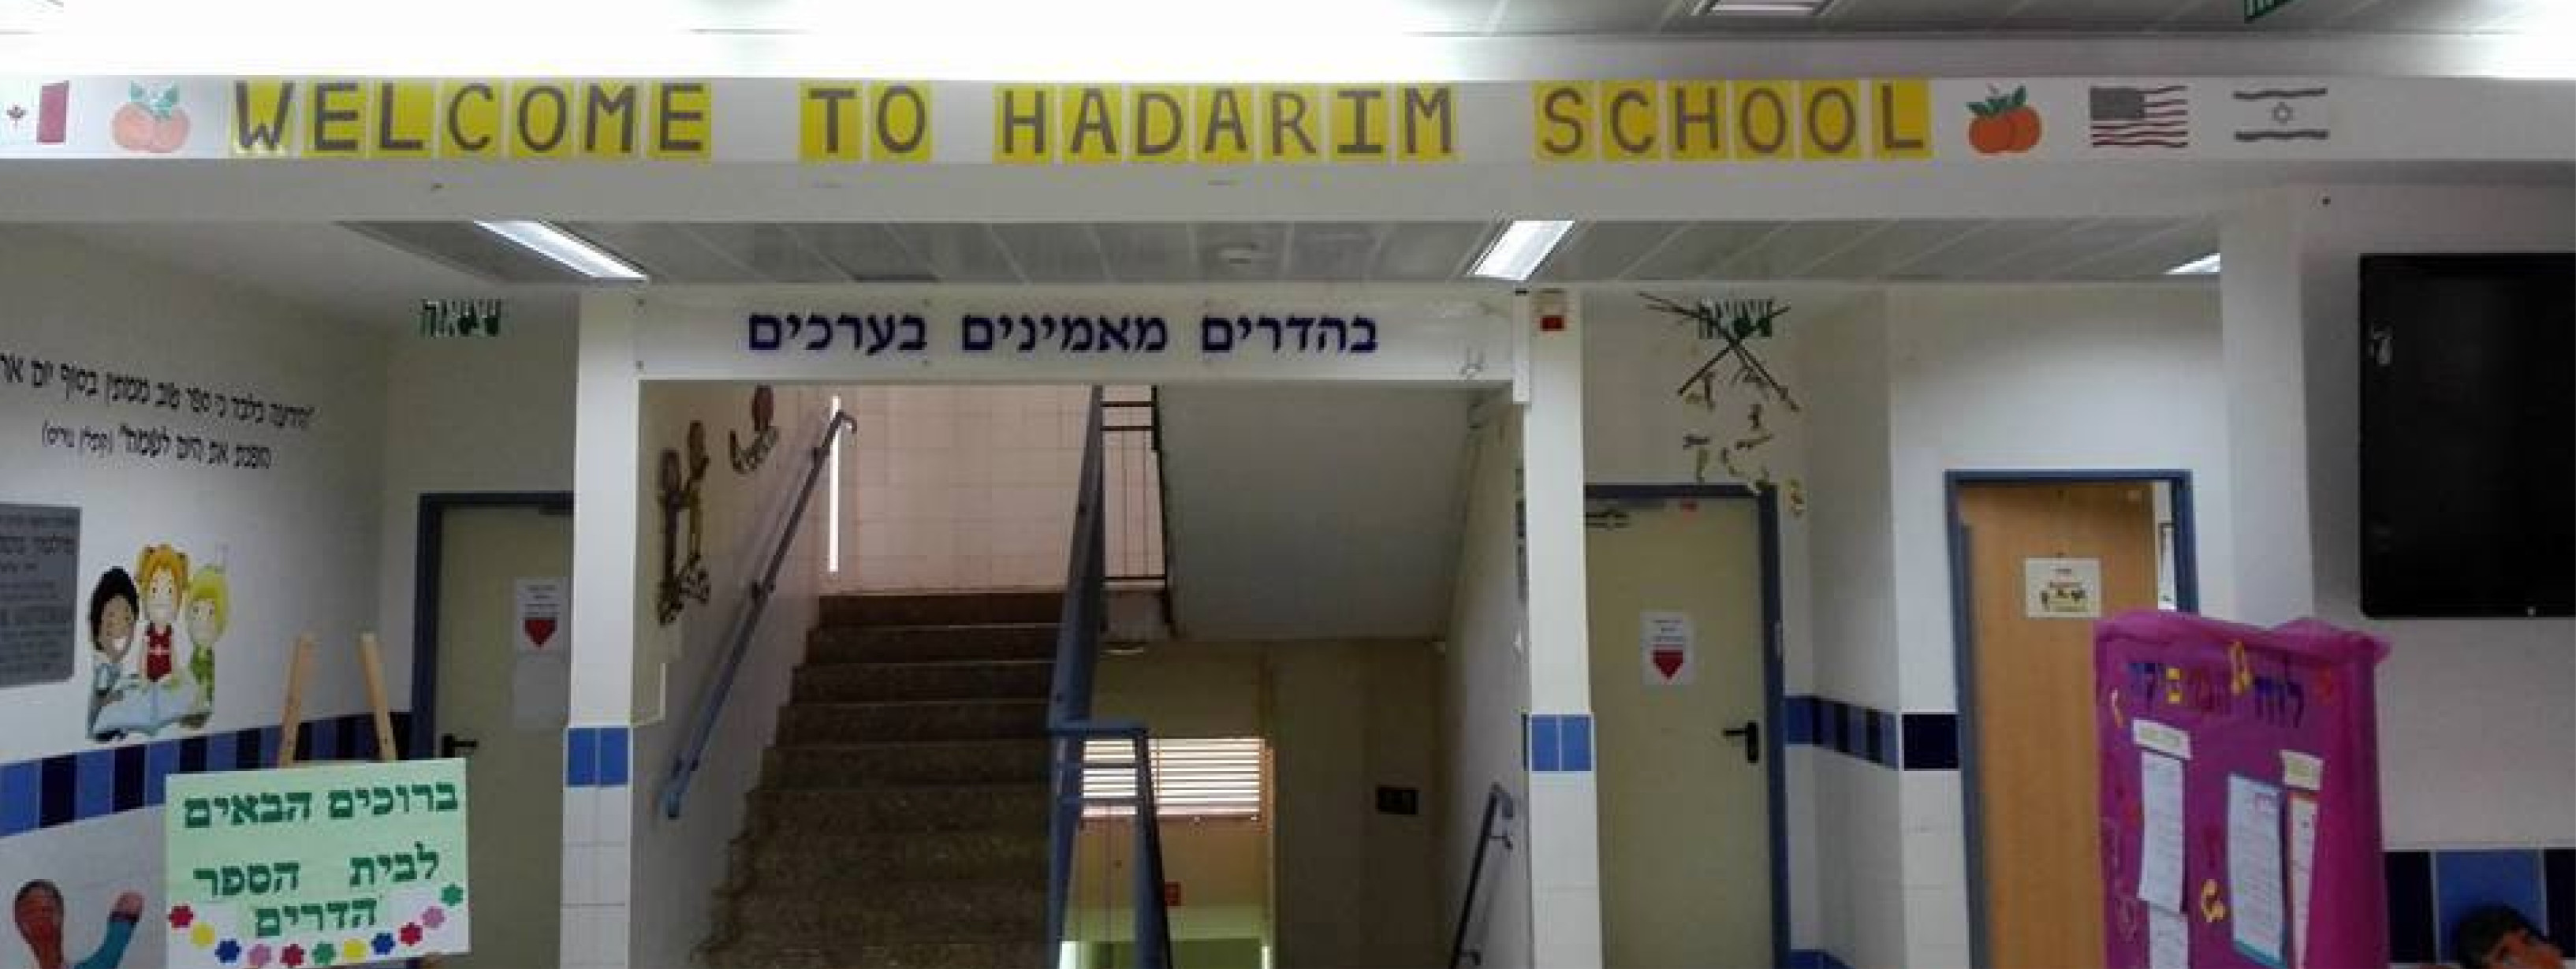 hadarim school